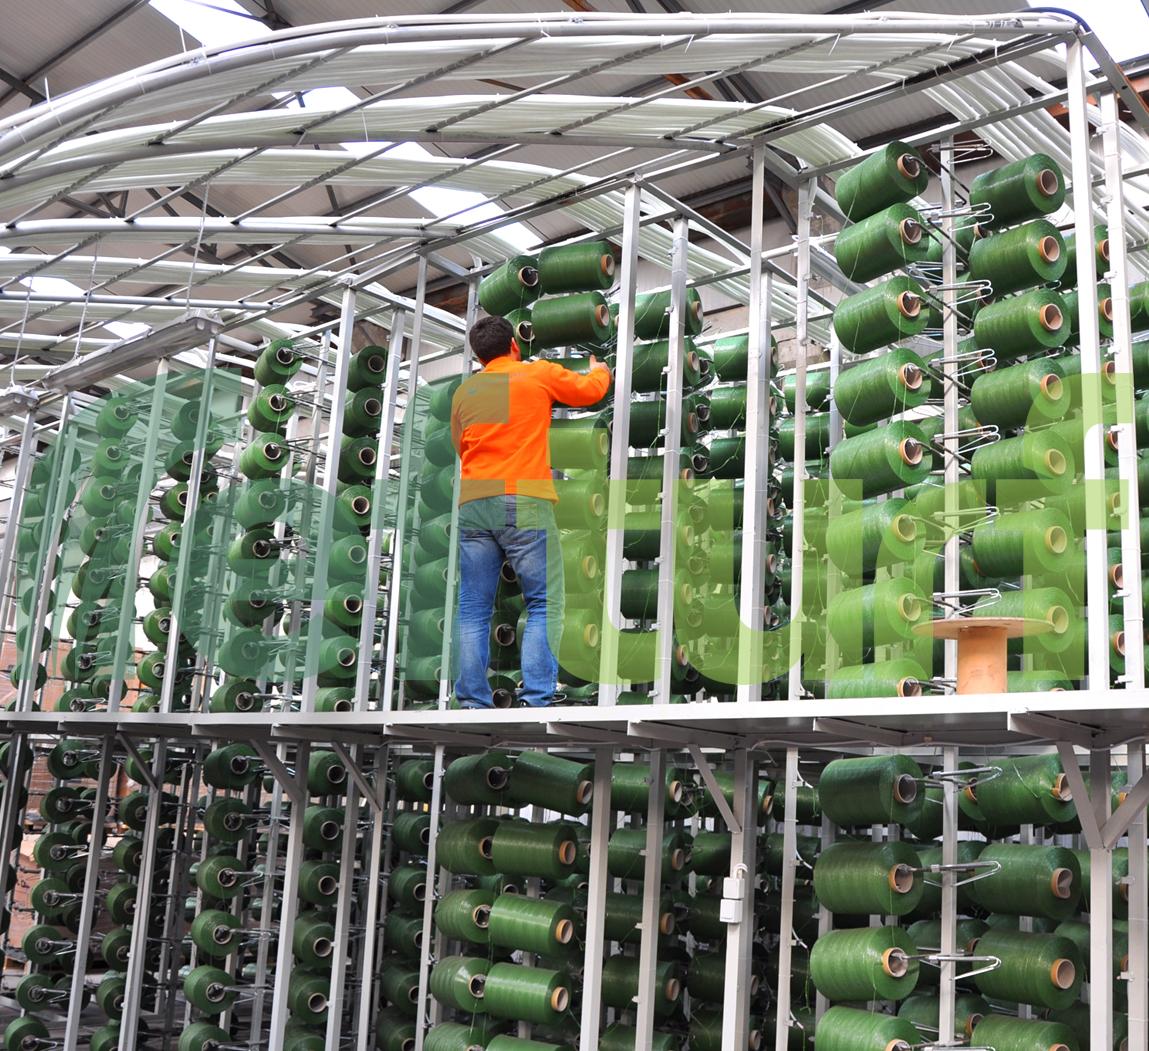 sentetik çim üretimi, sentetik çim, refturf firması, suni çim üretimi,